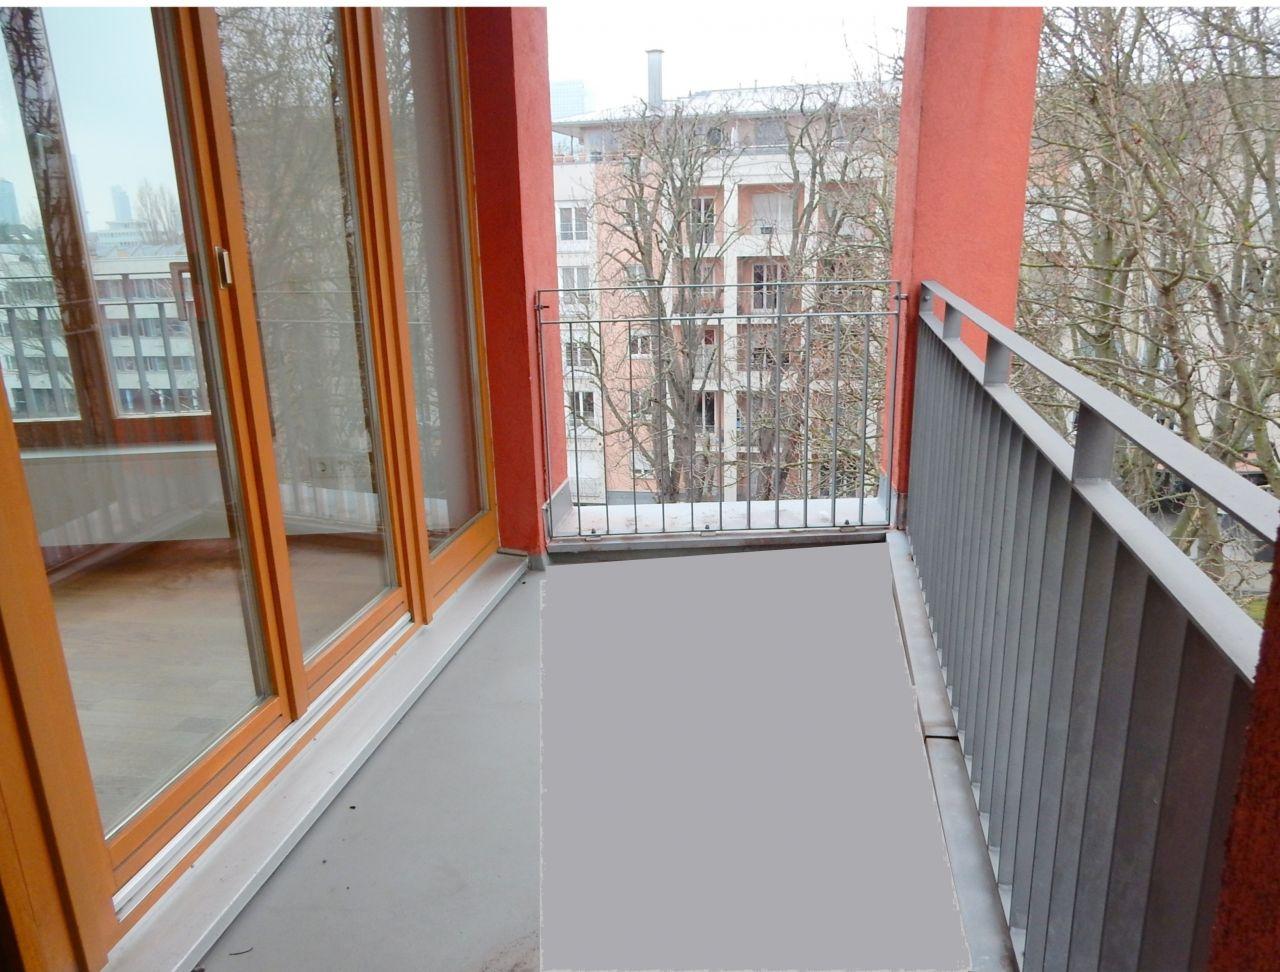 Balkon Nordseite